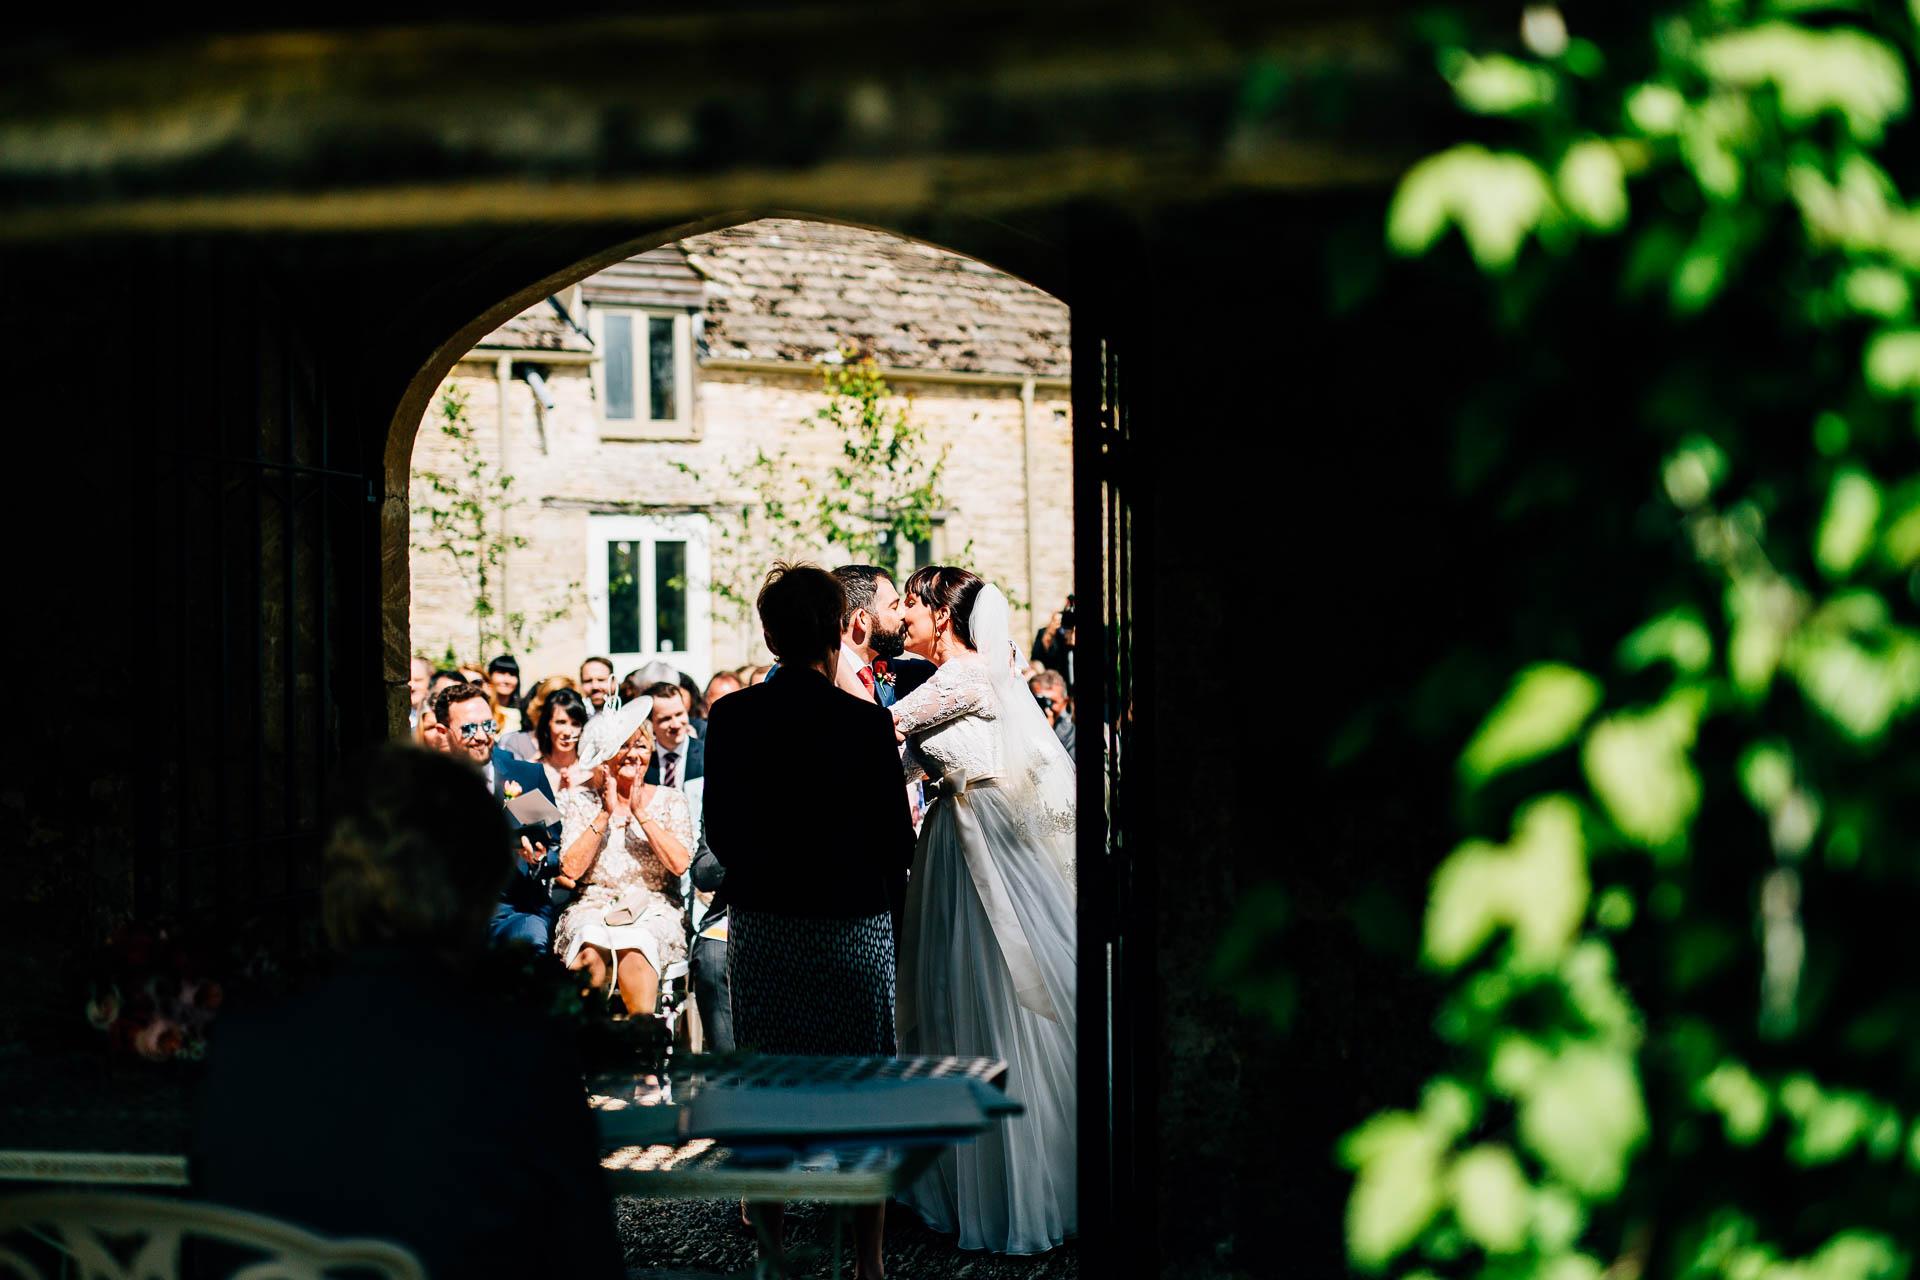 Caswell House Wedding Photography - Emma & Pete-77